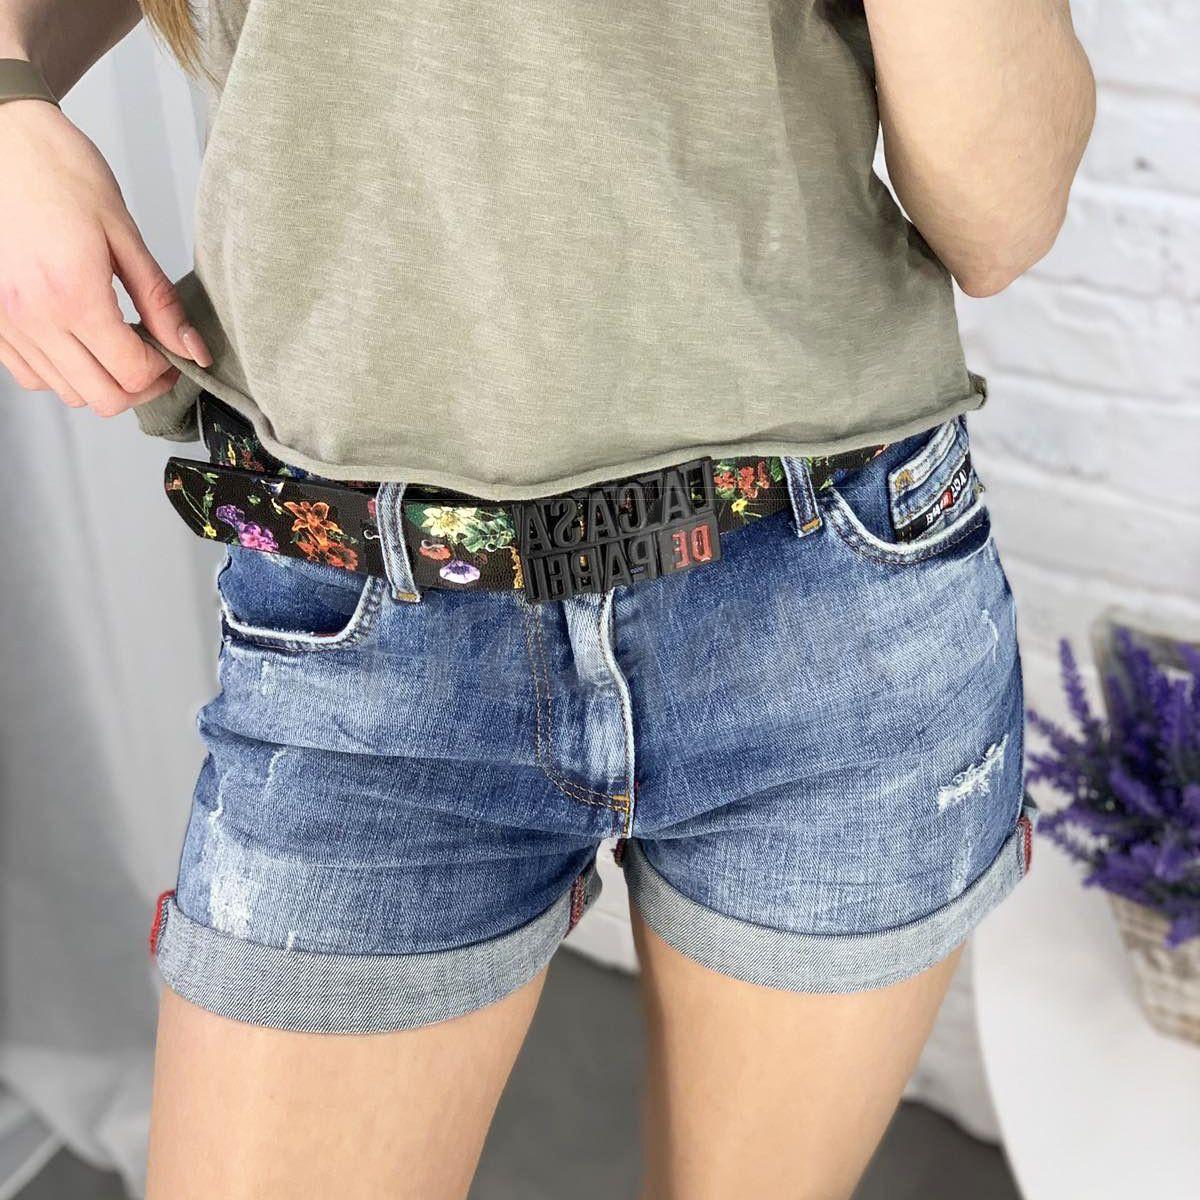 6617 Whats up 90s шорты джинсовые женские стрейчевые (5 ед. размеры: 26.27.28.29.30)